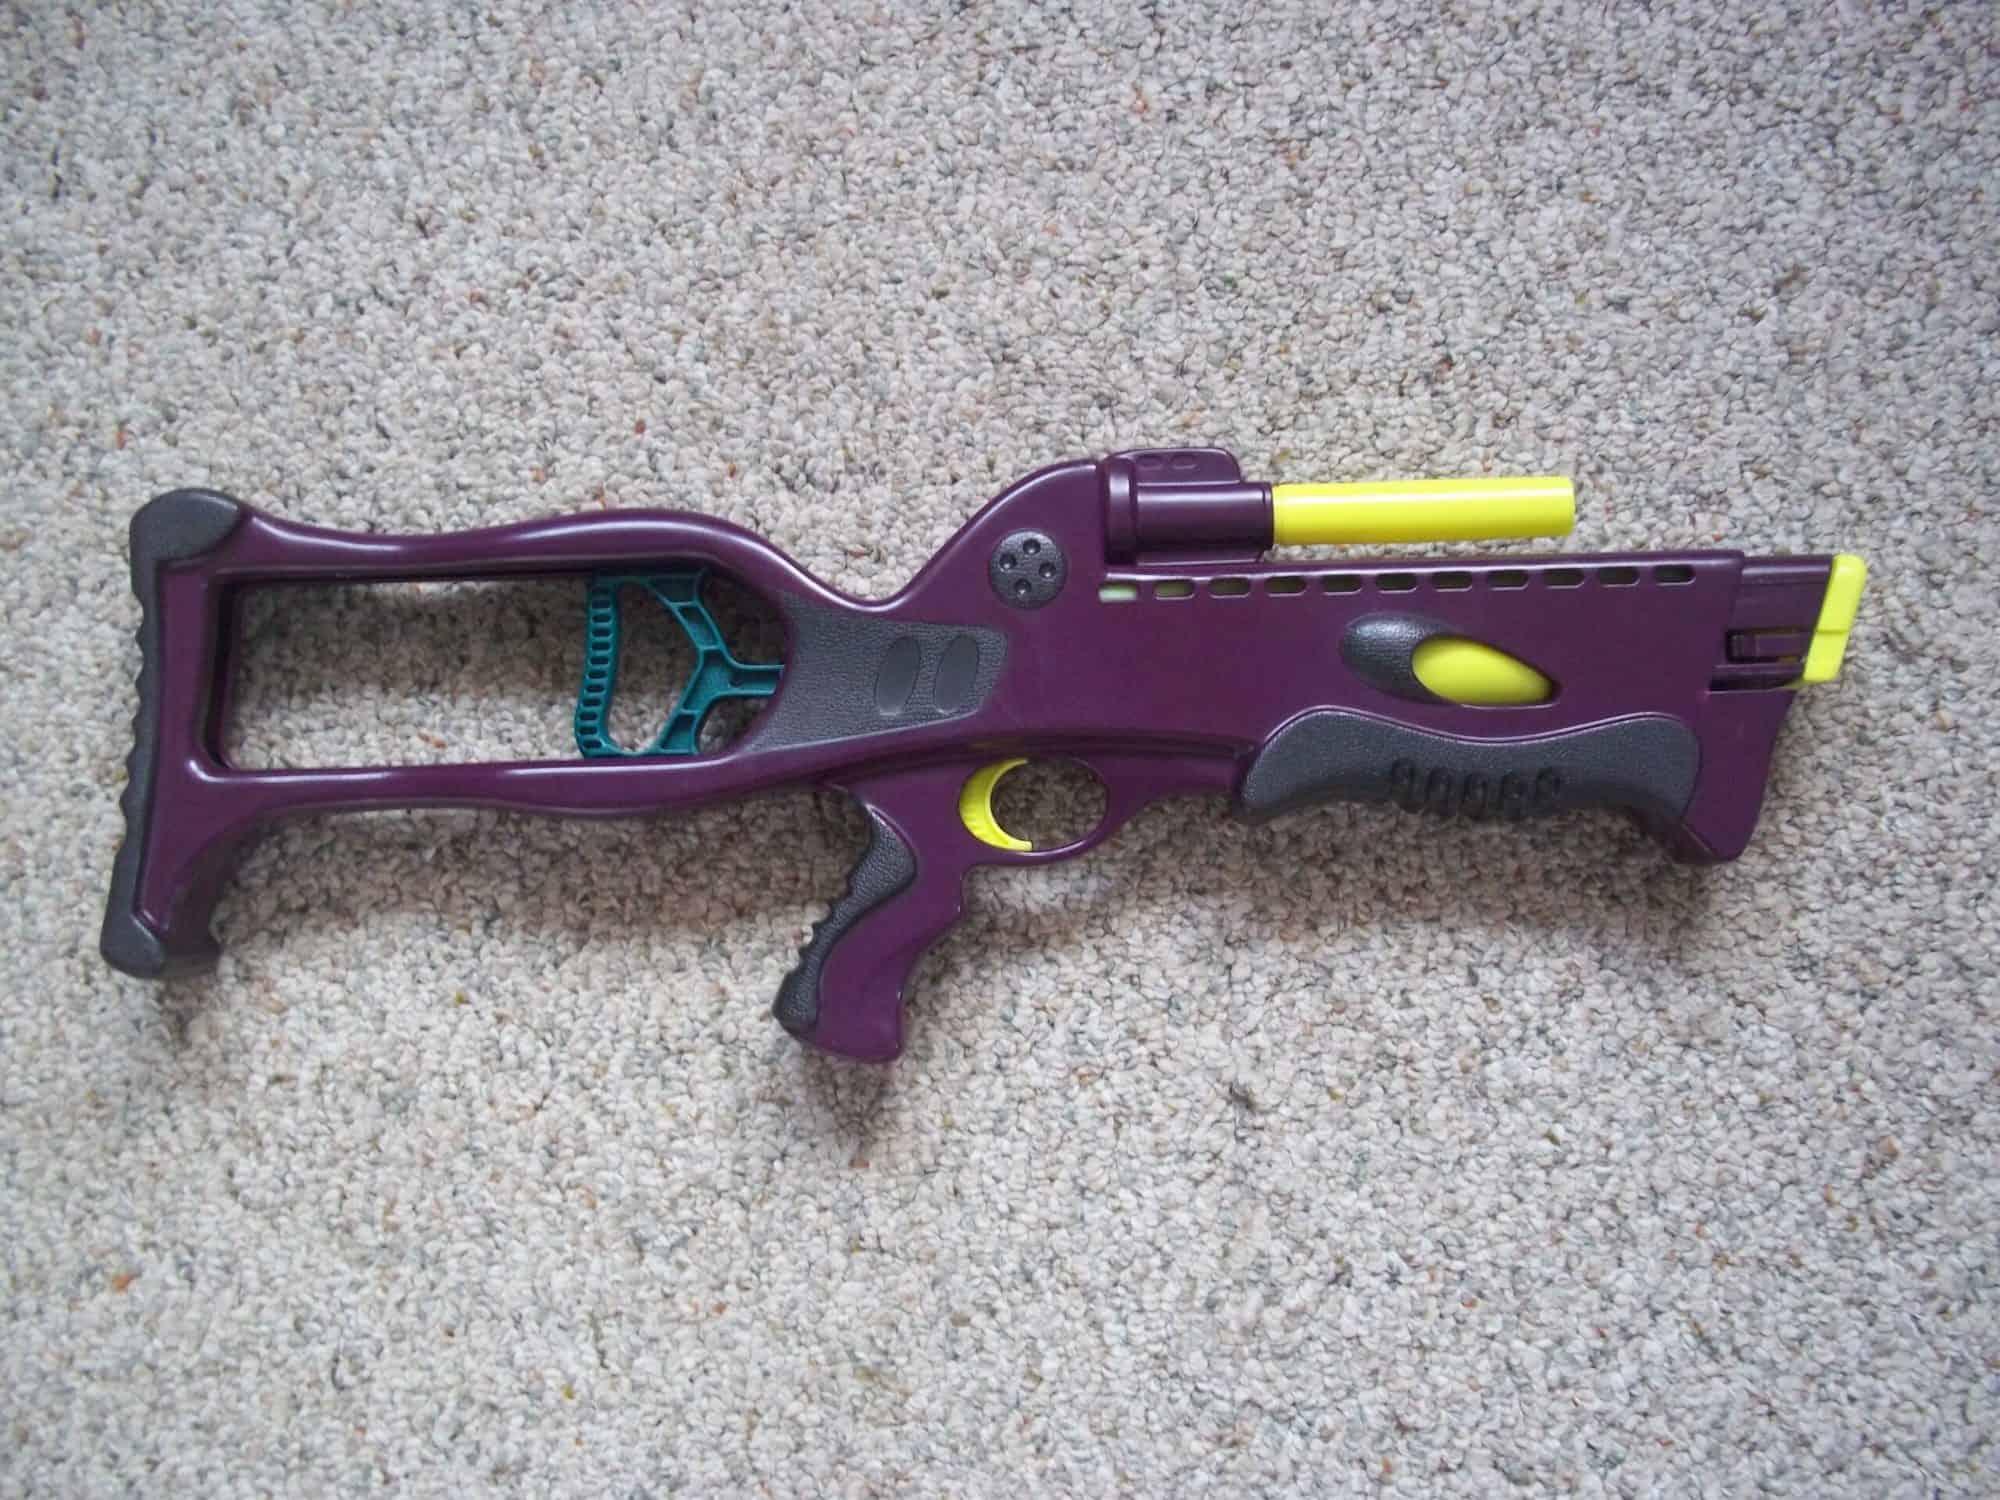 Most Expensive Nerf Guns - Original Nerf Crossbow (Purple Version) - $200